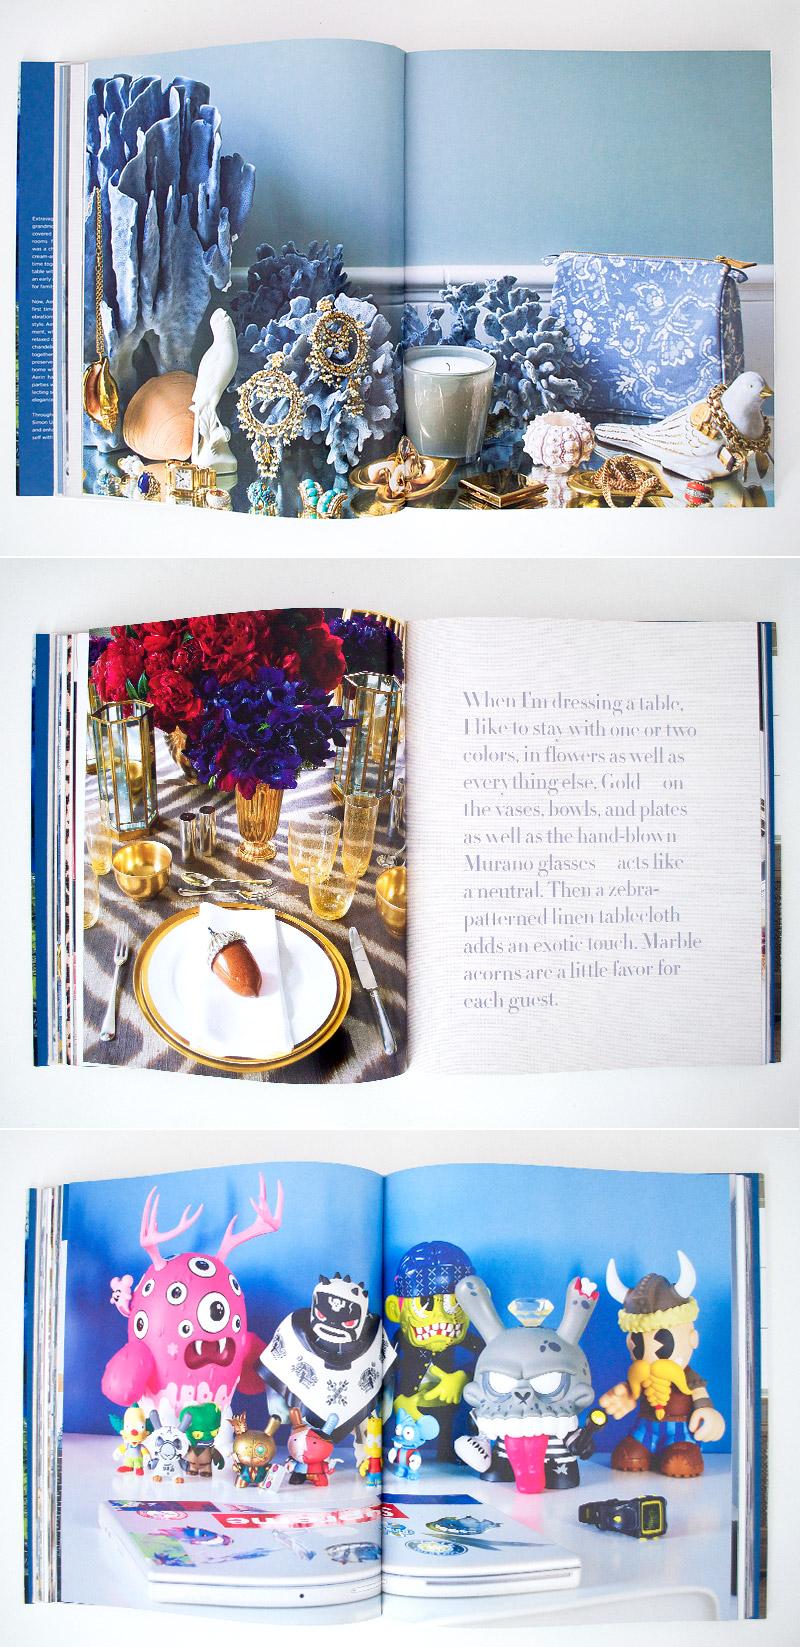 living-gazette-barbara-resende-decor-livro-beauty-at-home-aerin-lauder-paginas